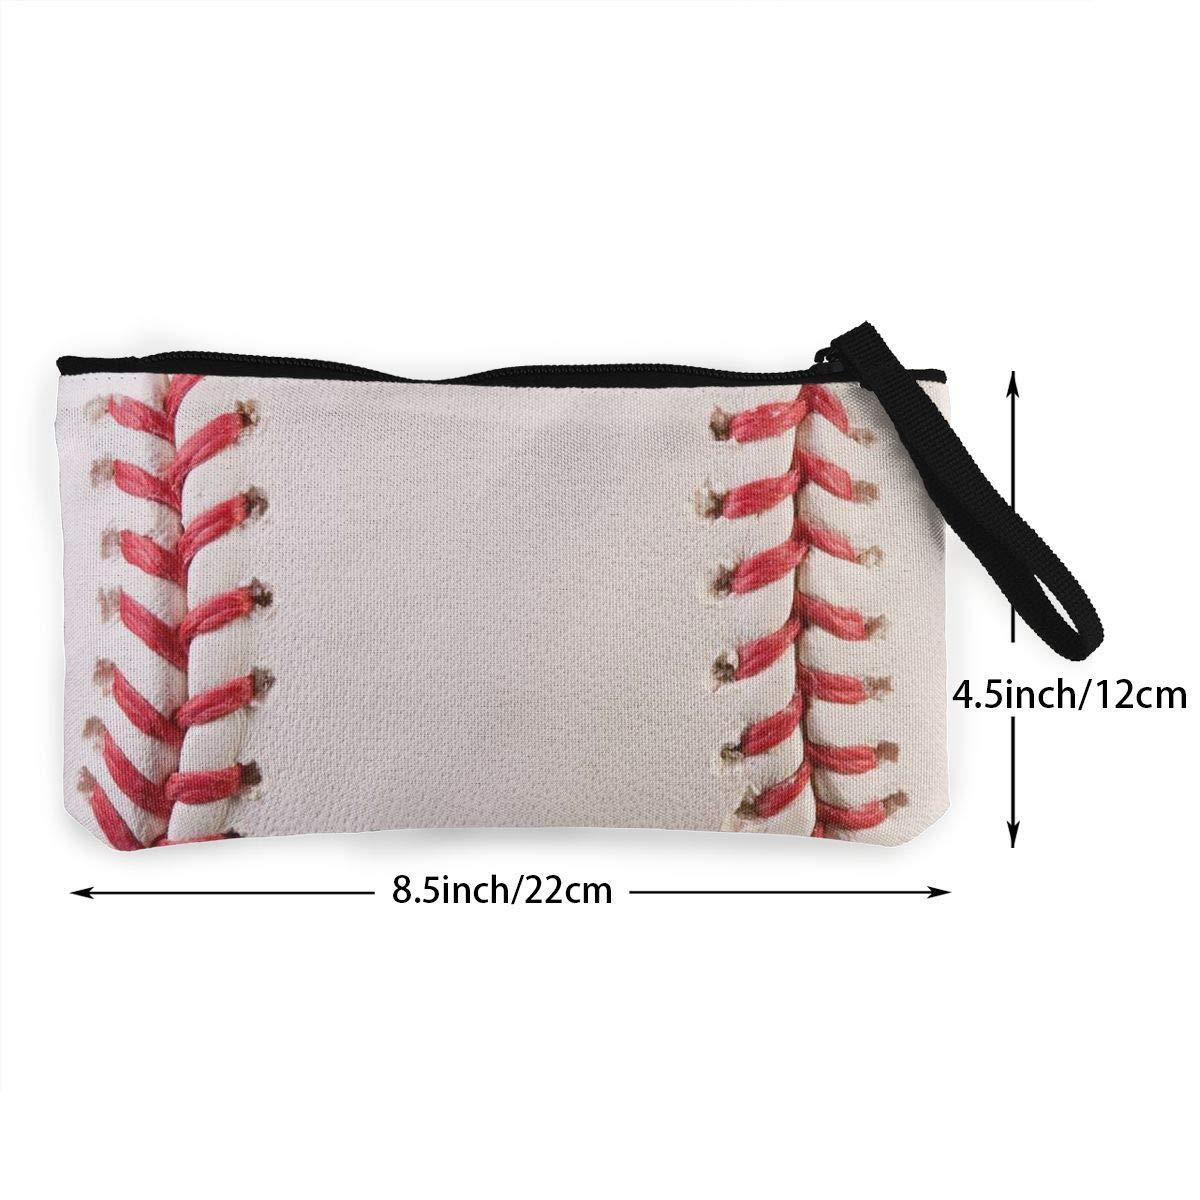 Canvas Cash Coin Purse,Baseball Lace Print Make Up Bag Zipper Small Purse Wallets